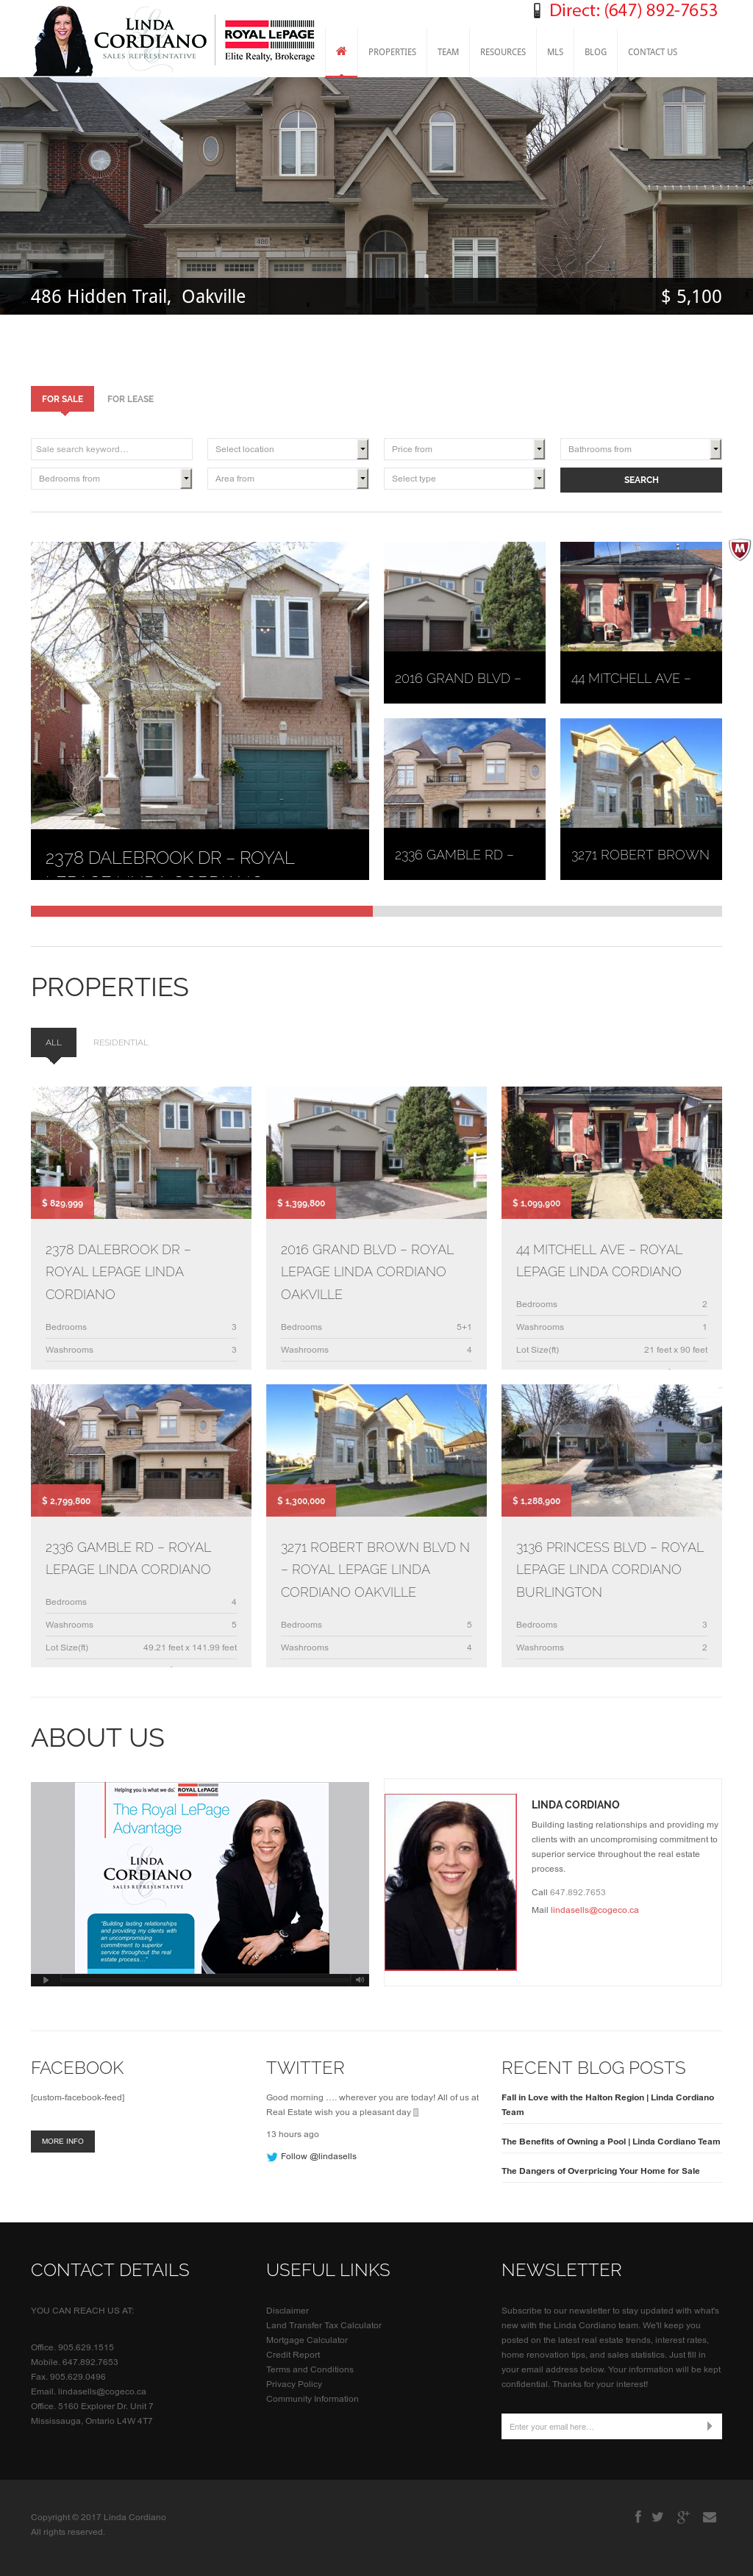 Real Estate Team Profile : Linda cordiano real estate team competitors revenue and